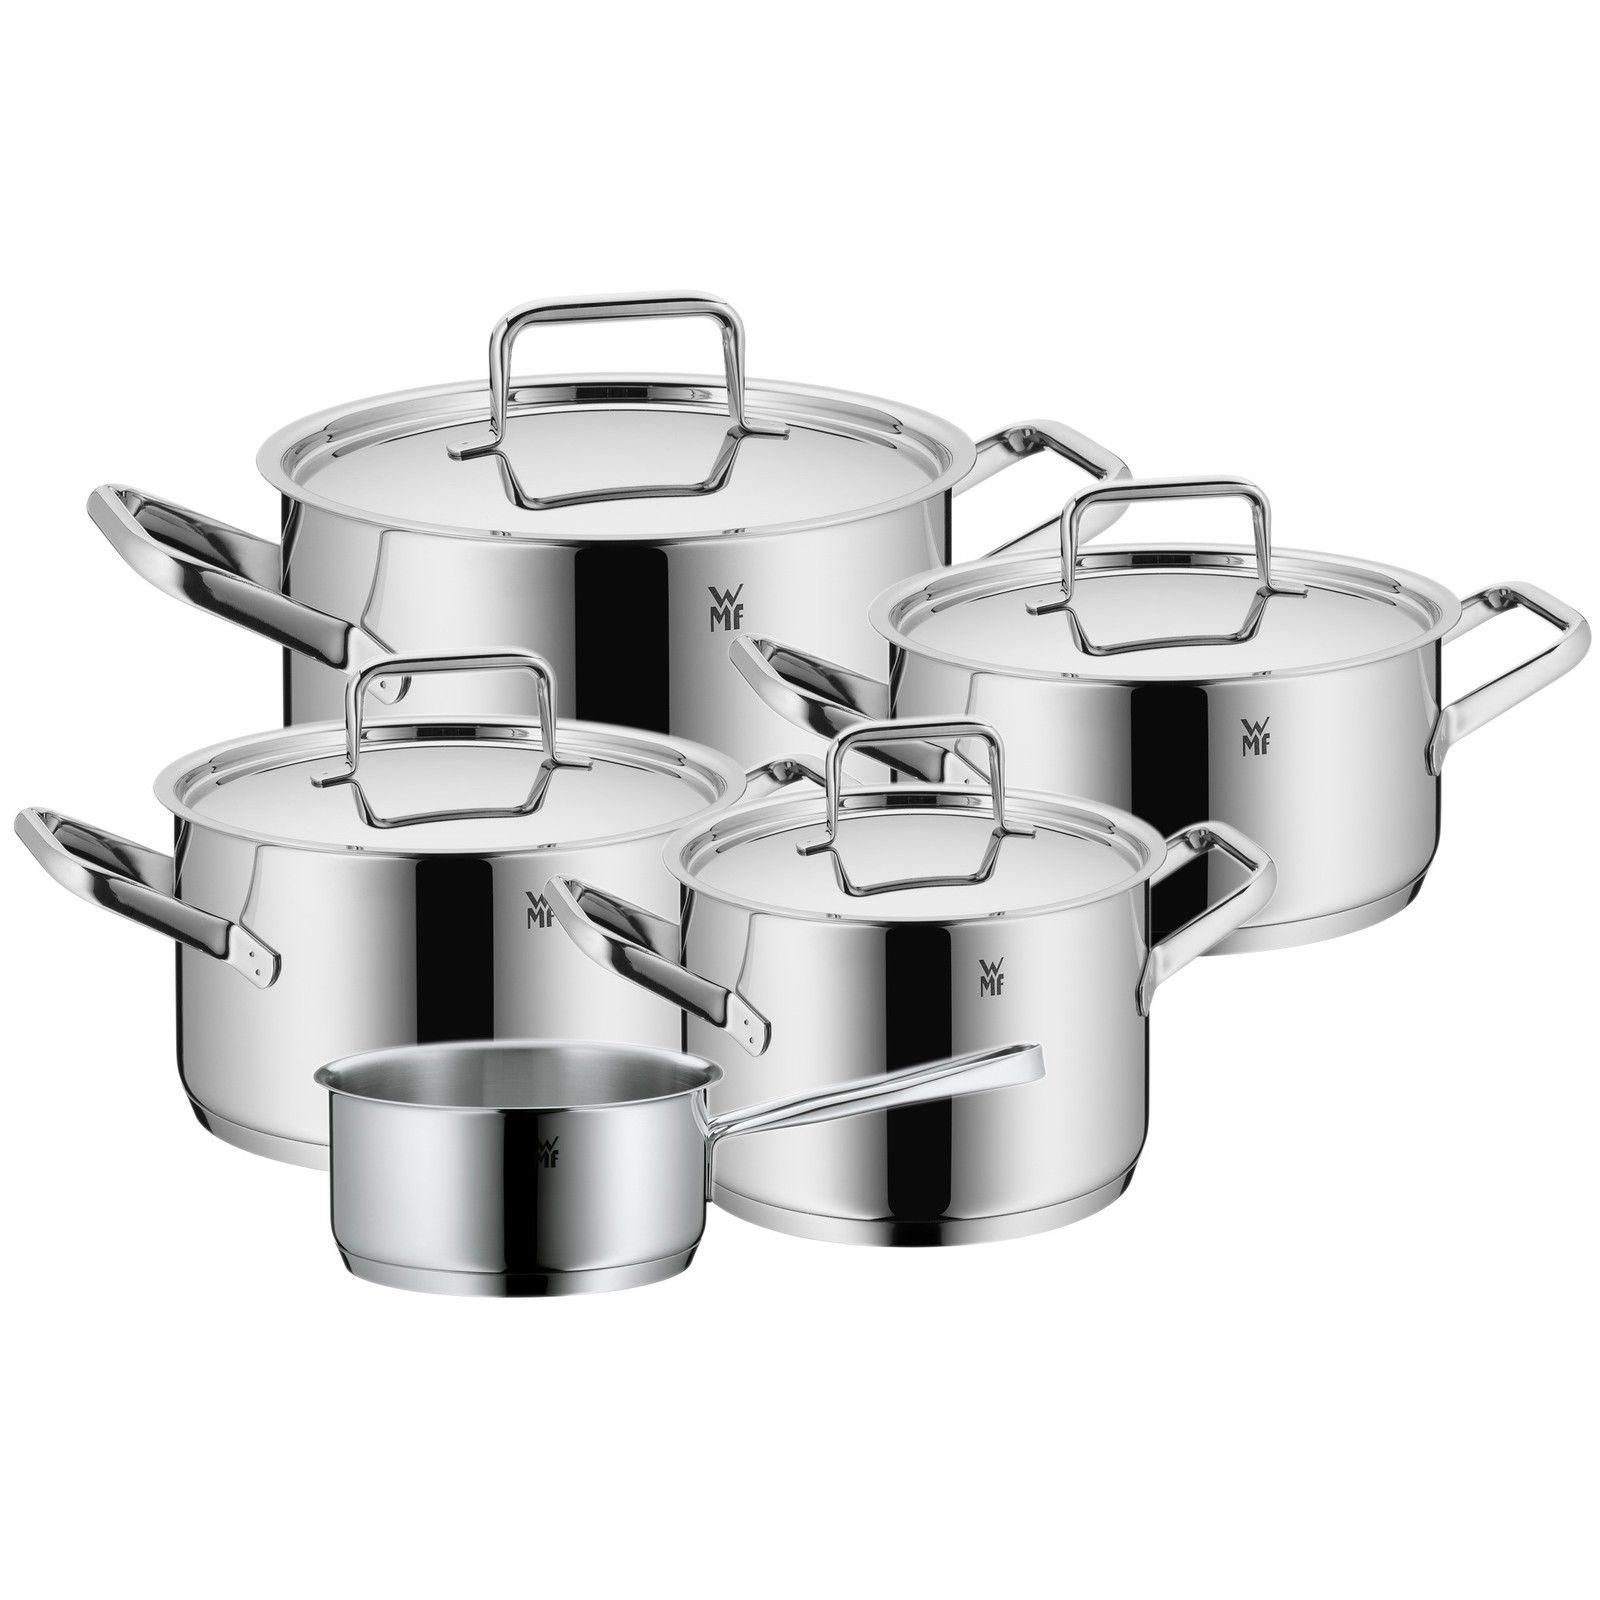 WMF Topf-Set 5-teilig Dimension Hohlgriffe Schüttrand Metalldeckel Cromargan®